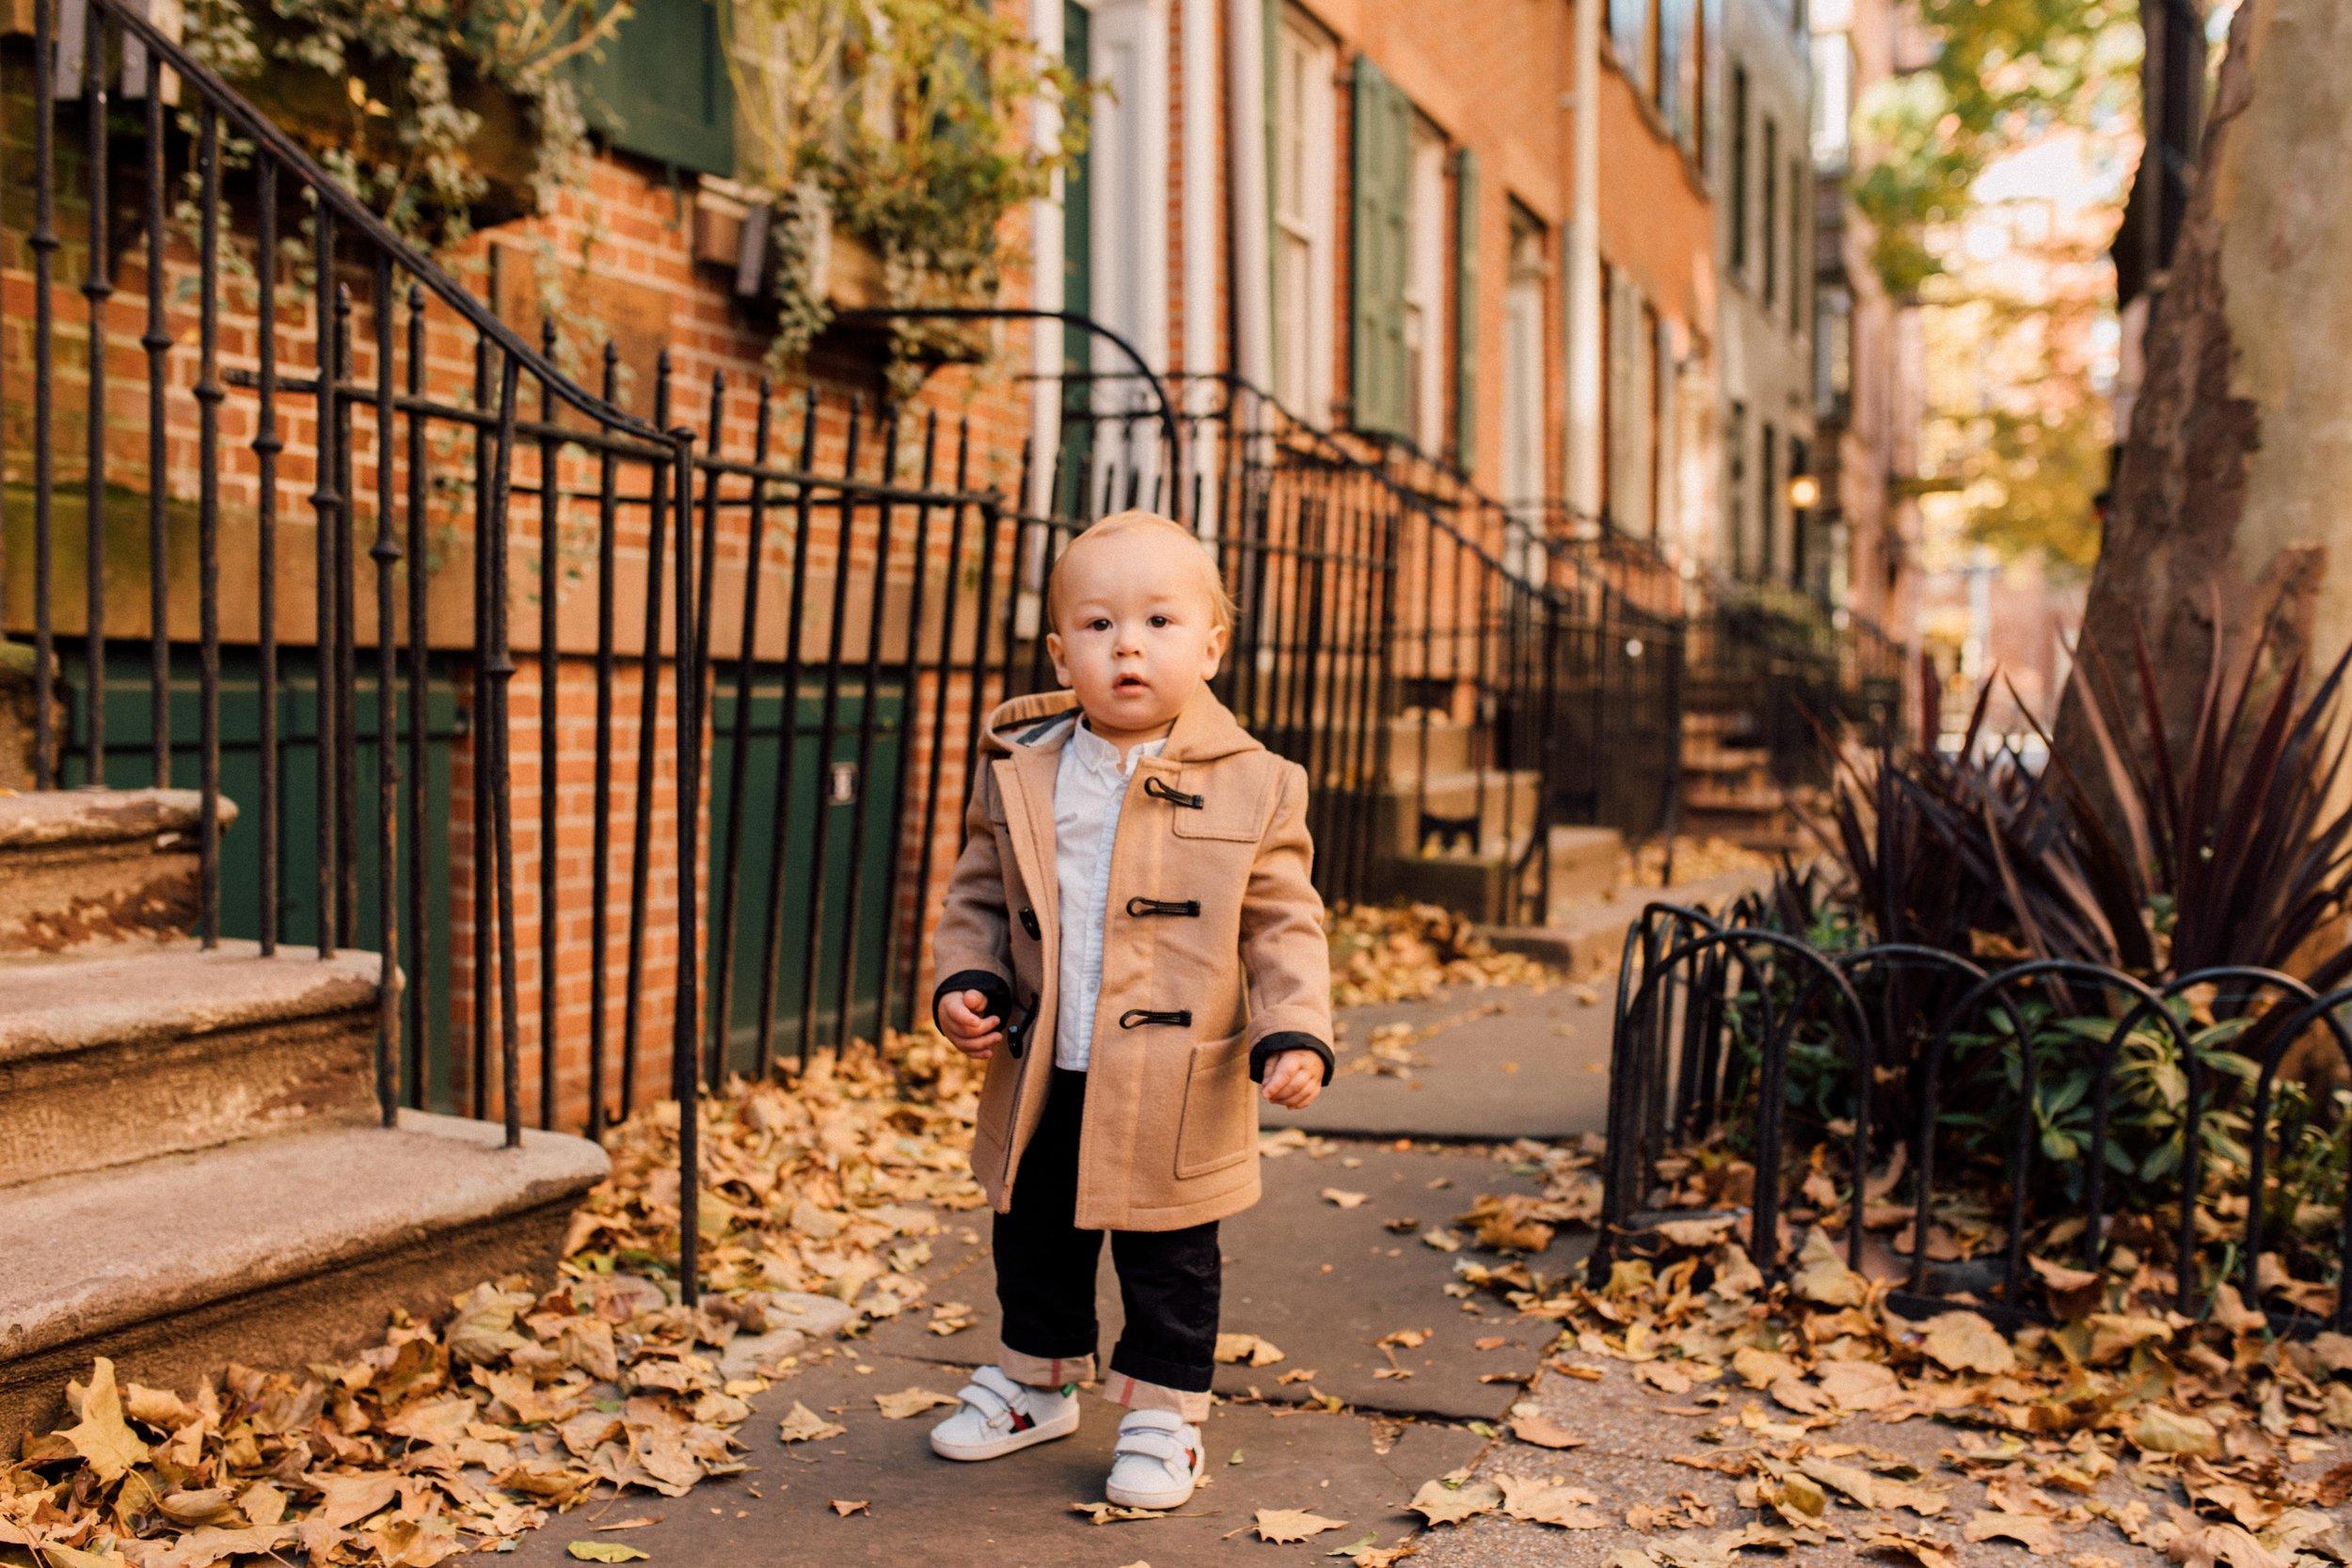 new_york_city_family_portrait_photographer (12 of 25).jpg